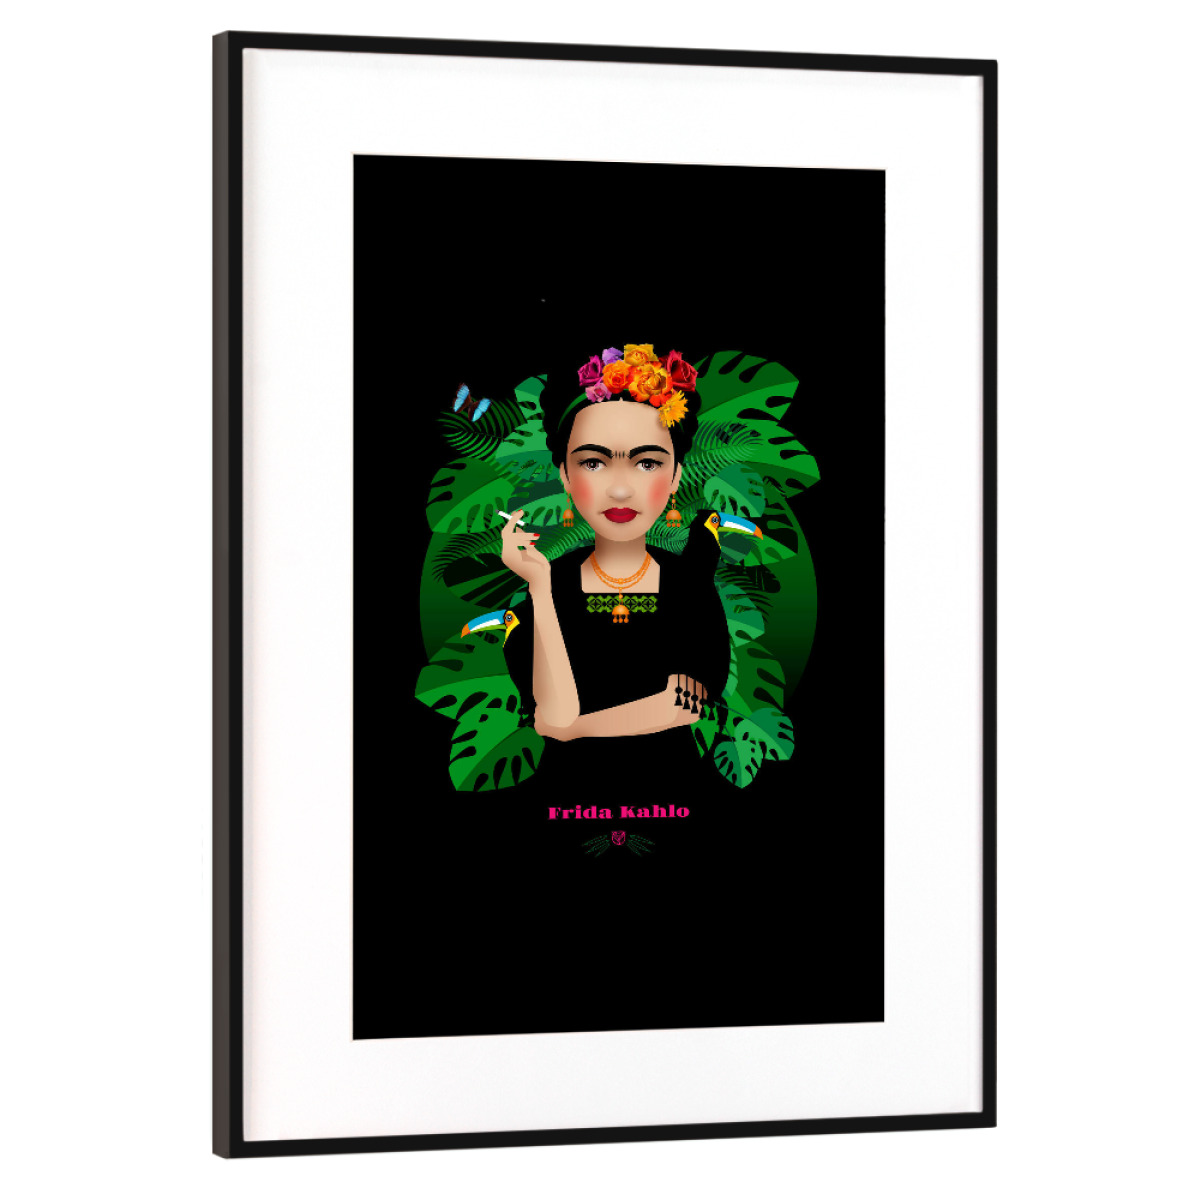 Frida Kahlo als Gerahmt bei artboxONE kaufen